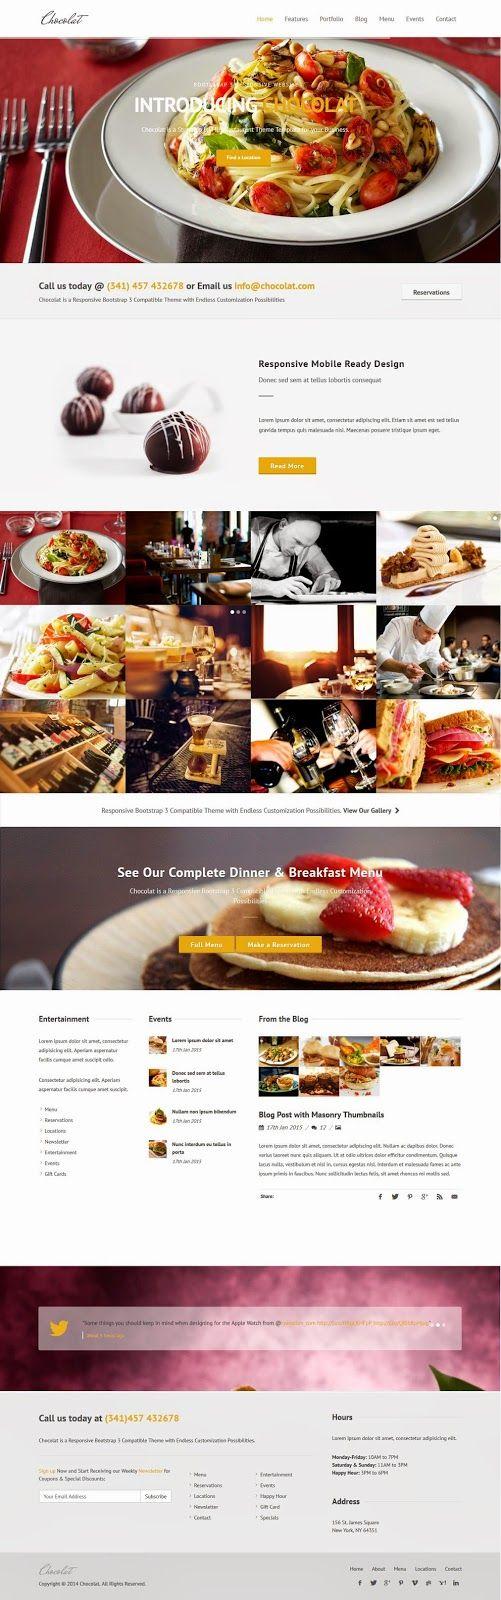 Chocolat - Bootstrap Restaurant Template 2015